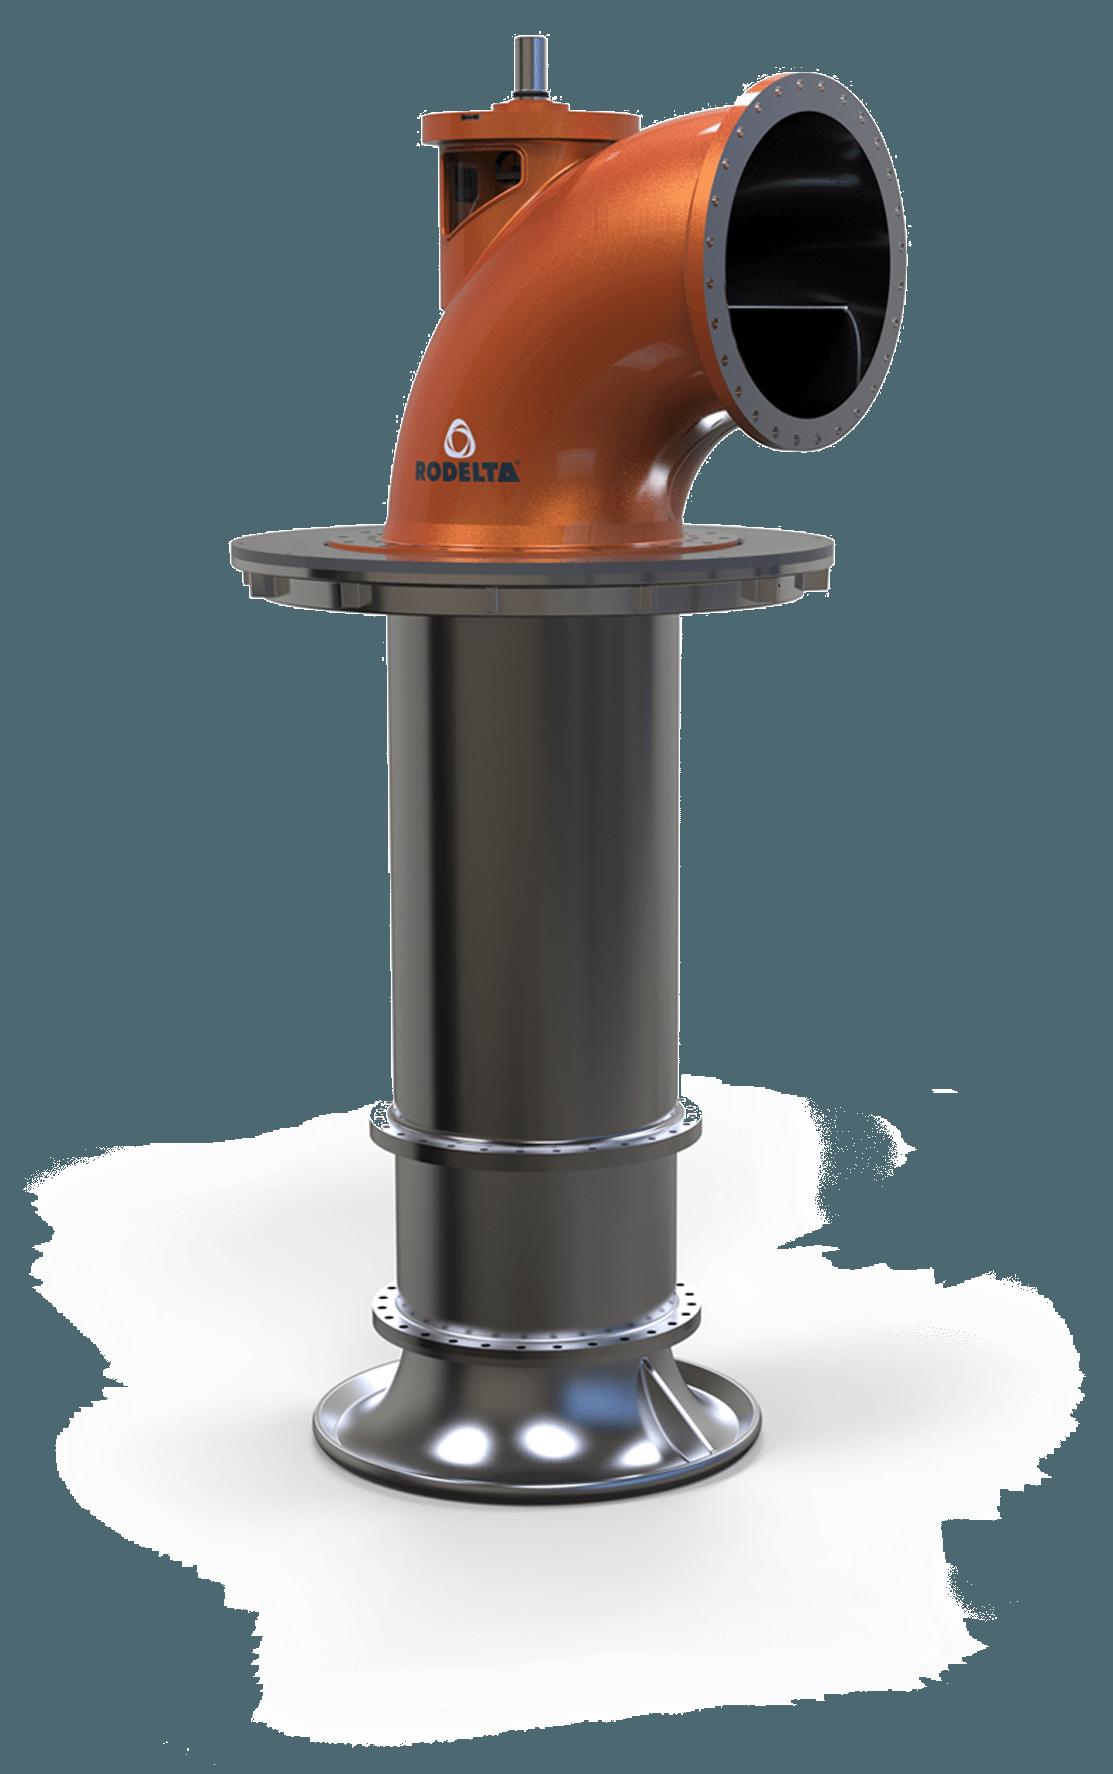 Bha Vs3 Axial Vertical Turbine Rodelta